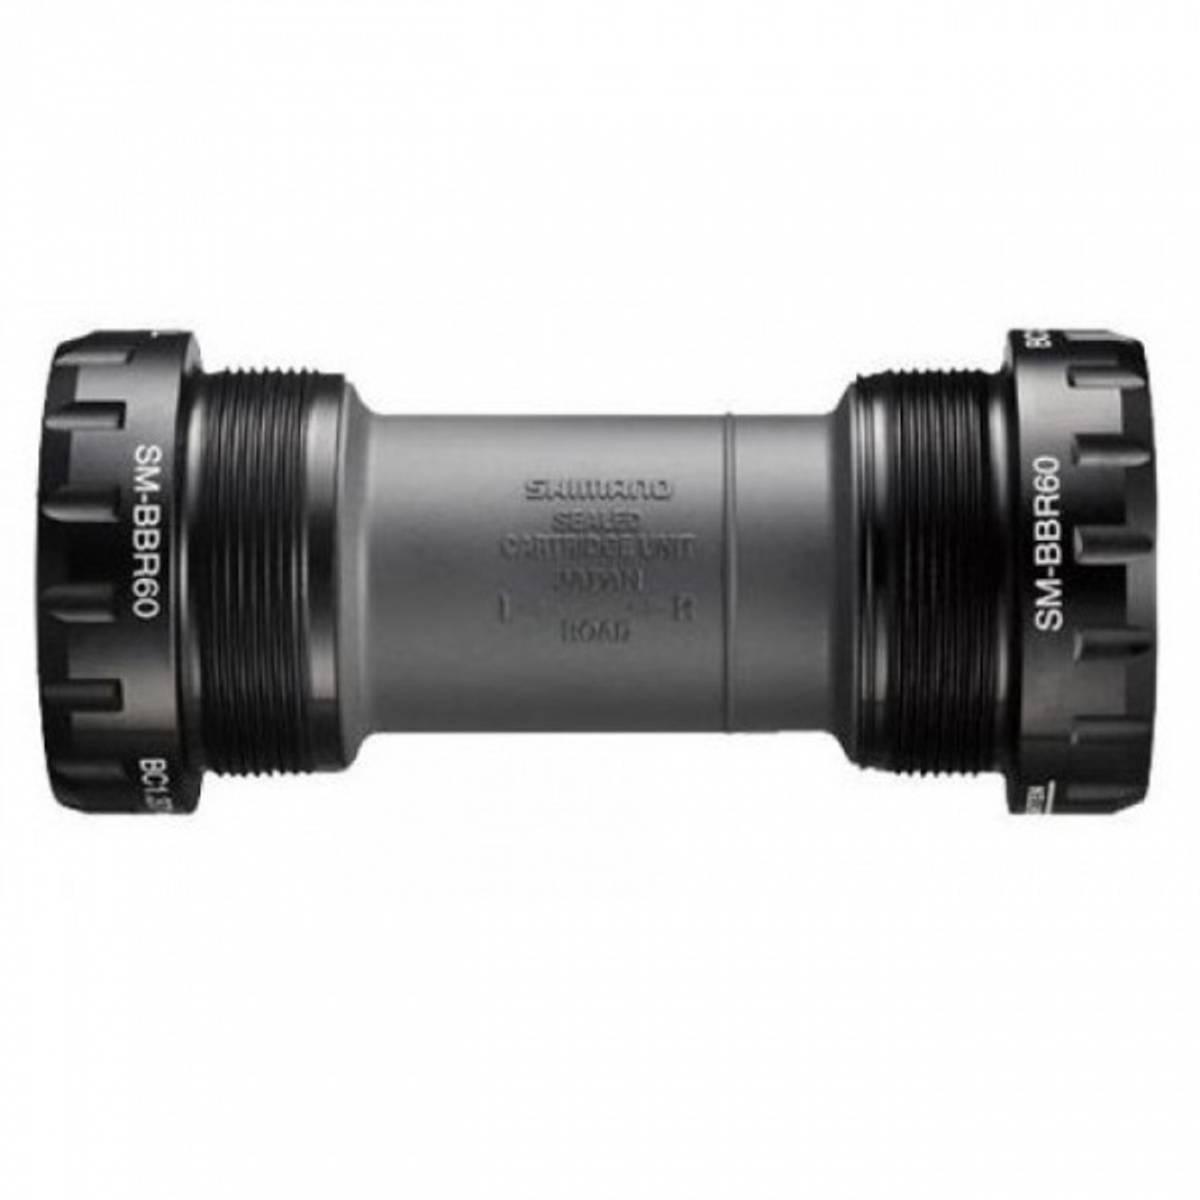 Shimano Ultegra 6800, SM-BBR60 Hollowtech II BSA kranklager